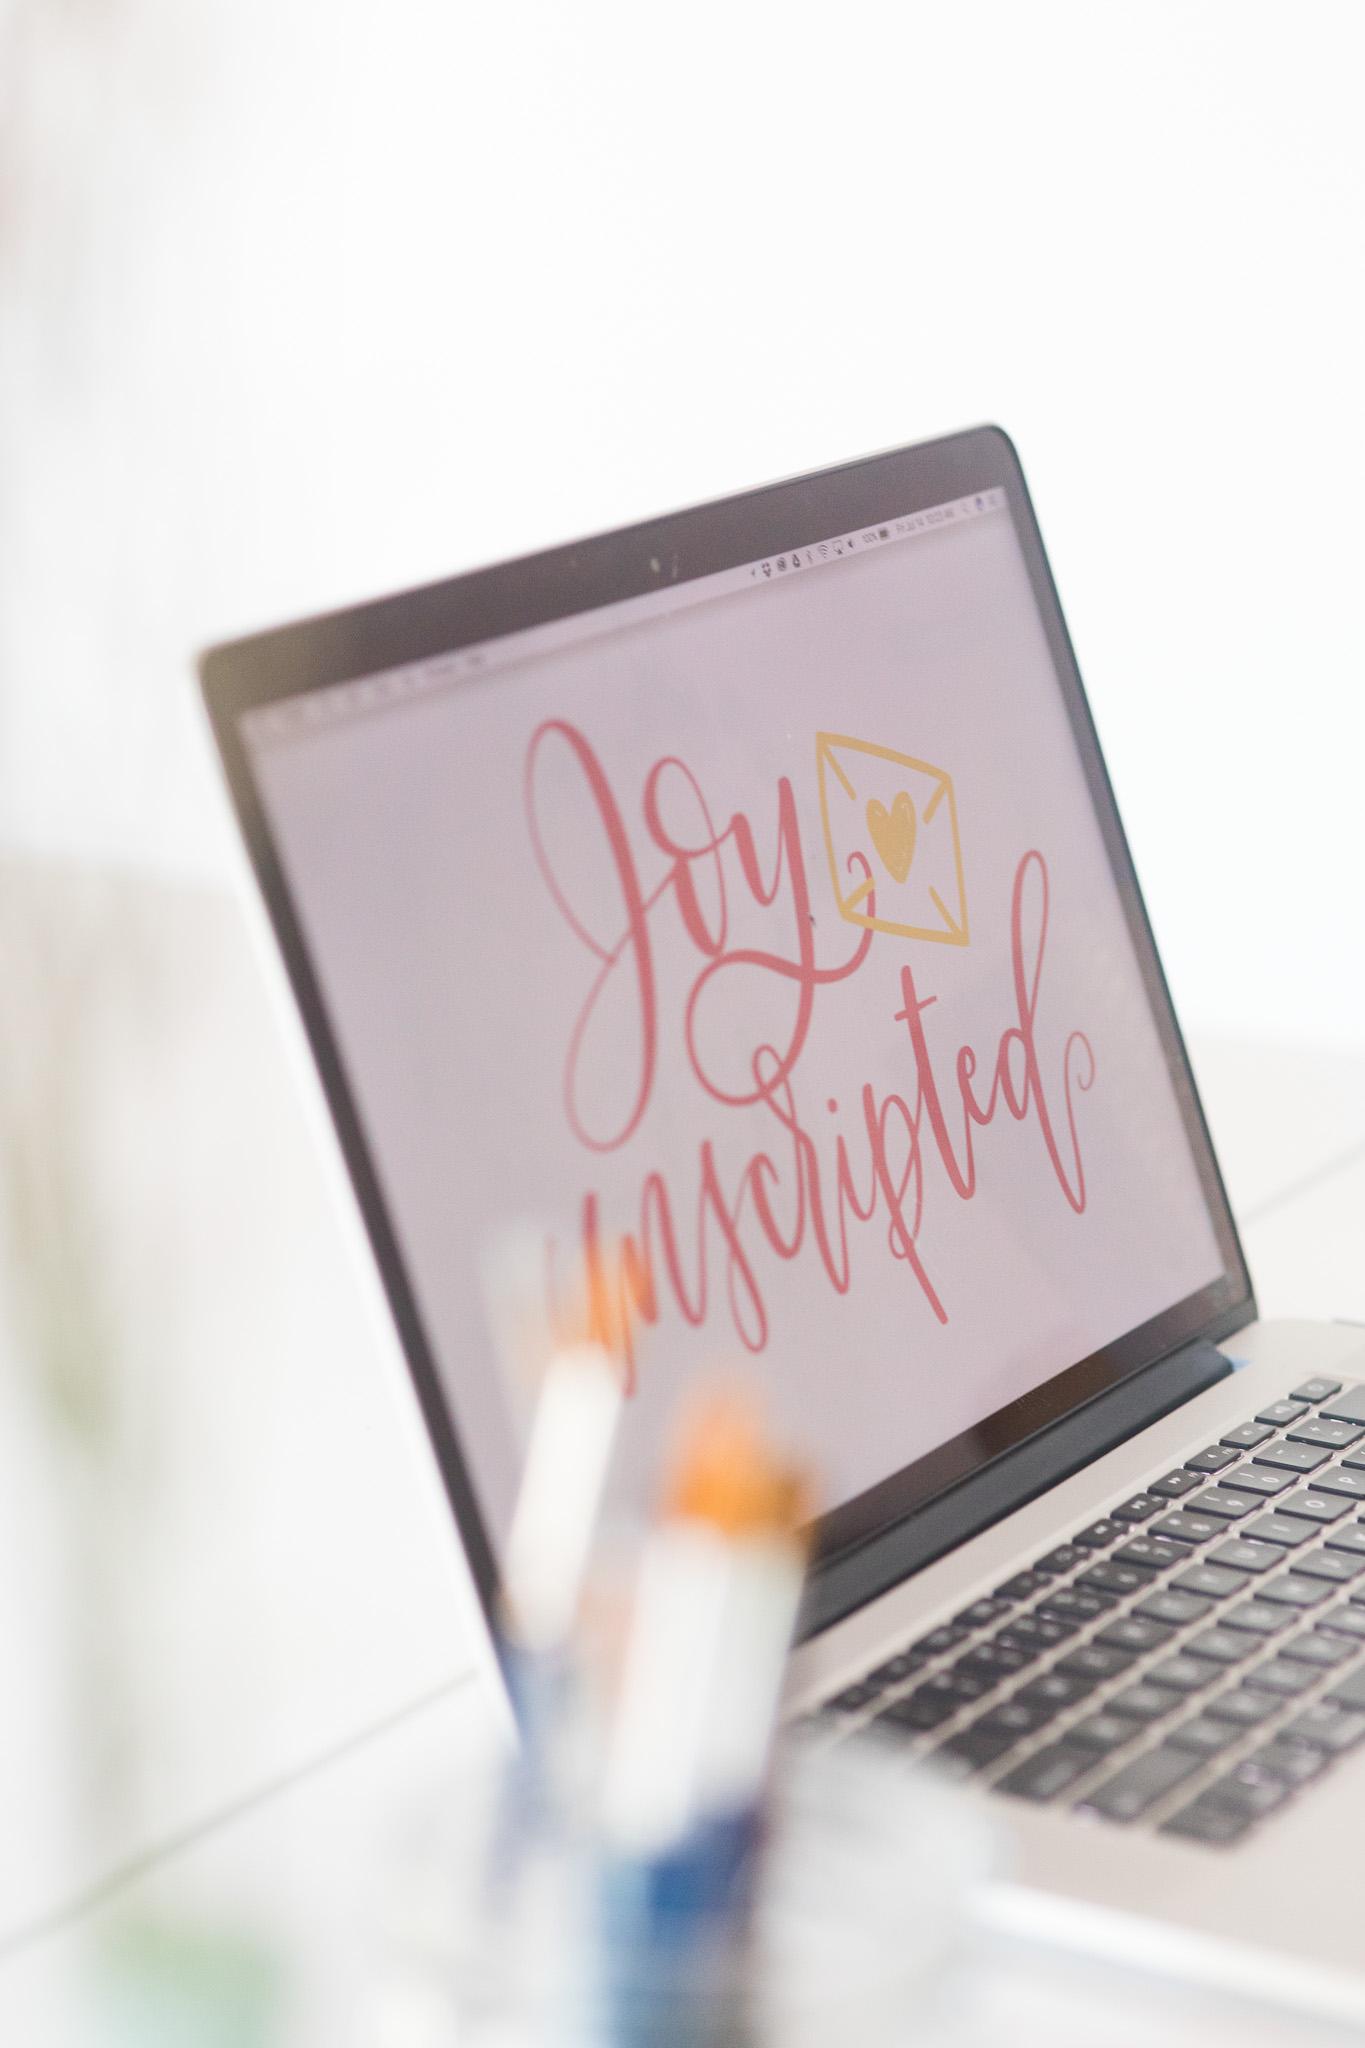 Engaged-Asheville-Joy-Unscripted-Wedding-Calligrapher-Kathy-Beaver-Photography-8.jpg